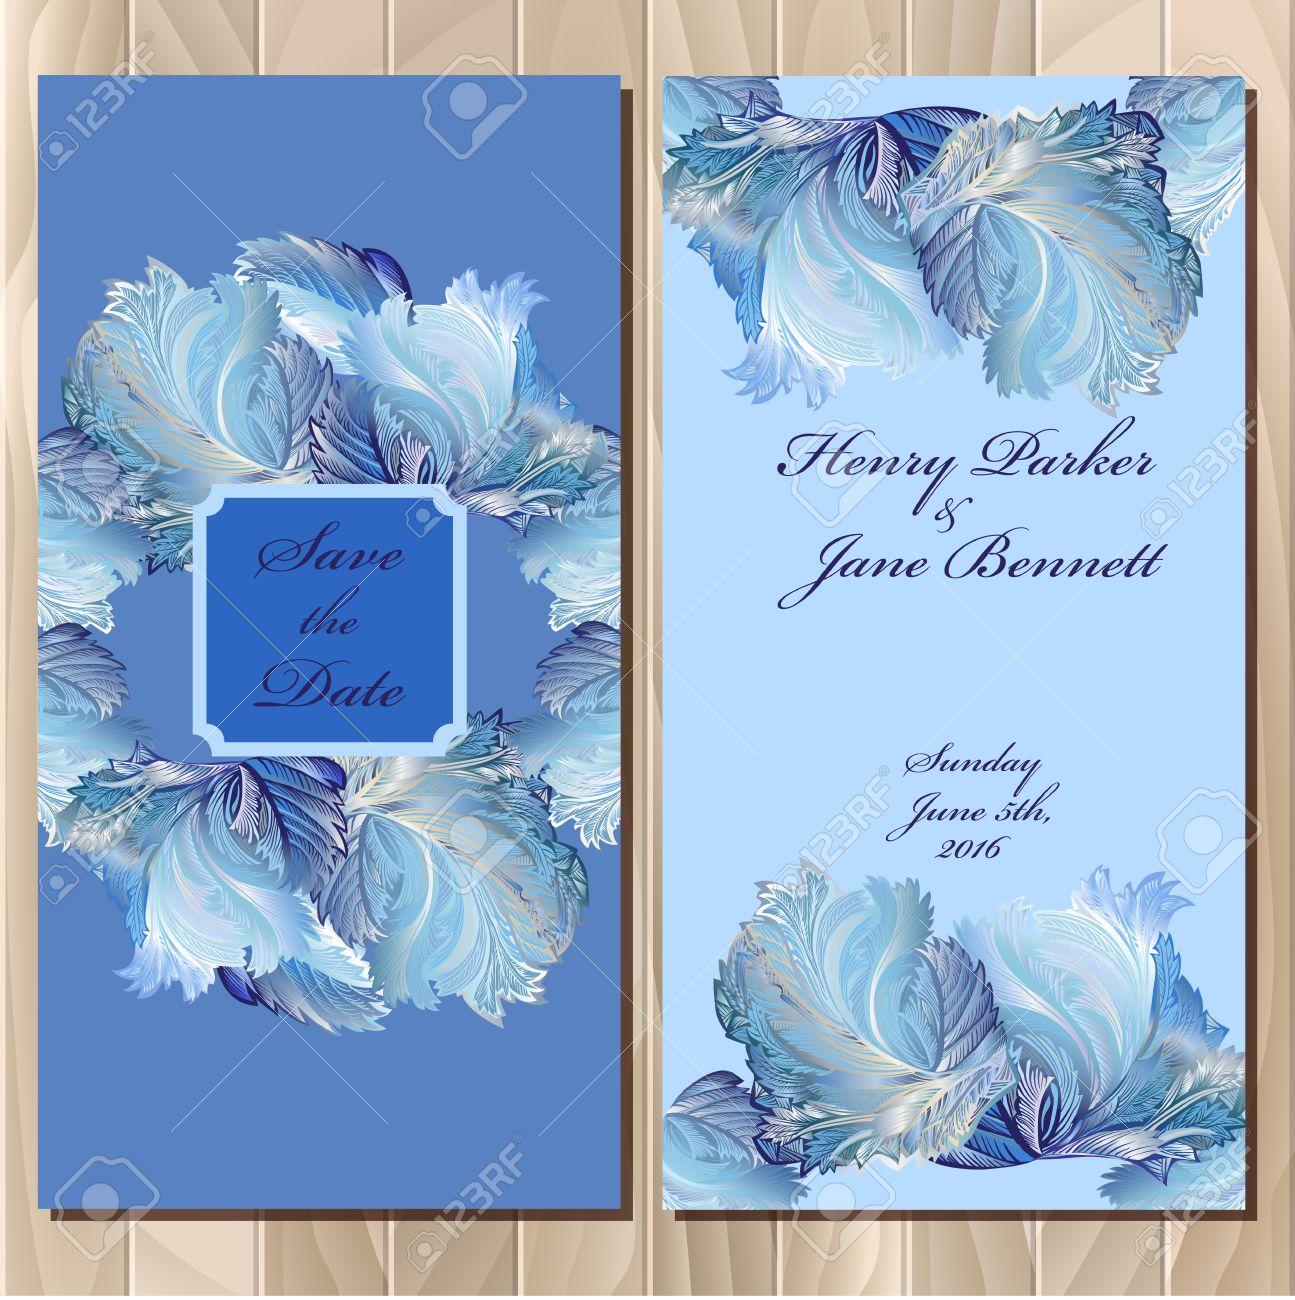 Blue wedding background design hd clipartsgram com - Wedding Invitation Card With Frozen Gl Design Printable